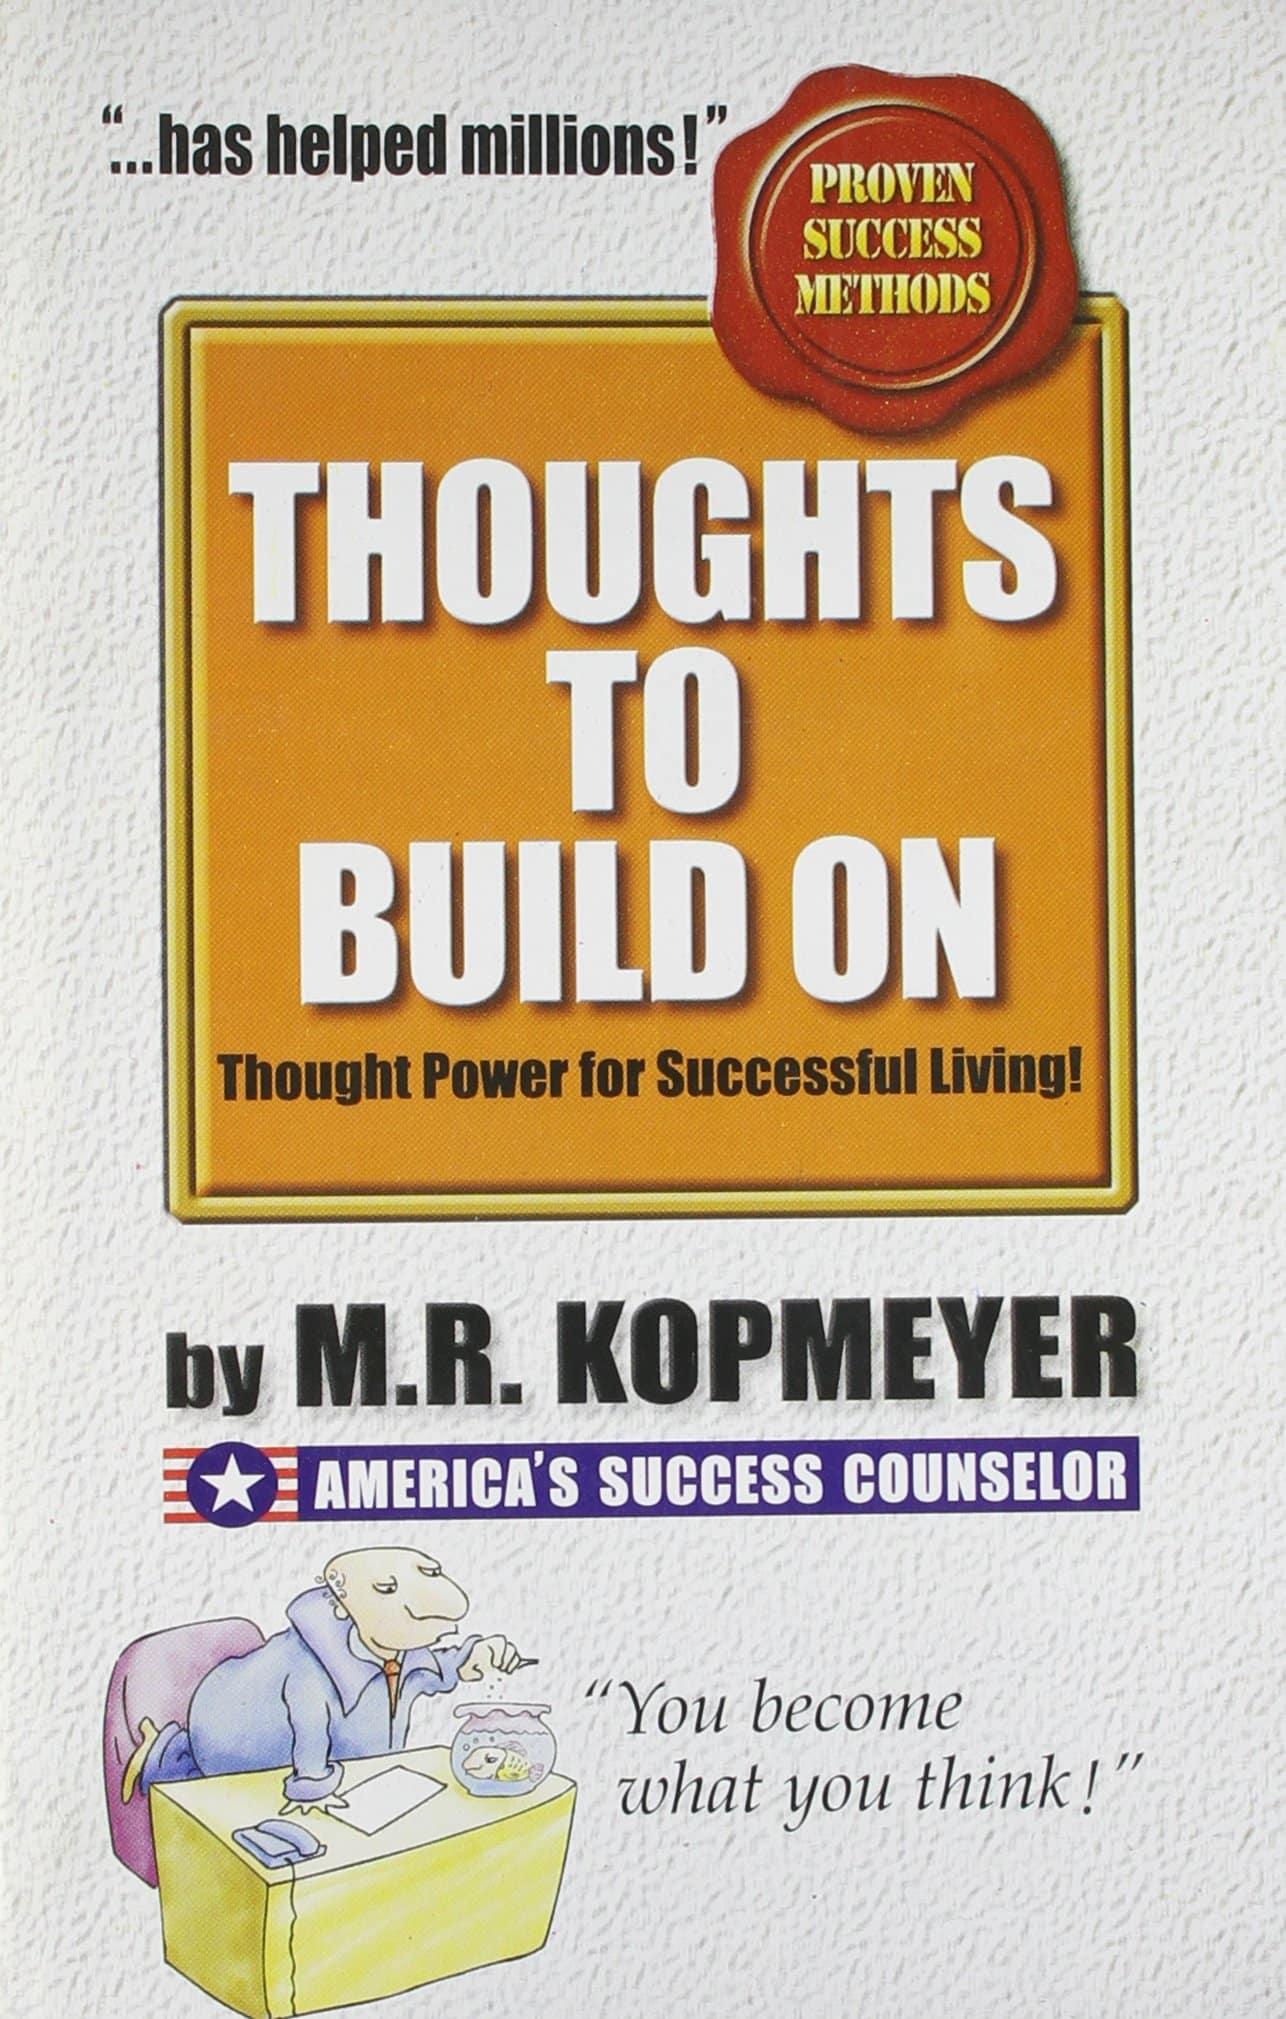 Classic Kopmeyer Success Book